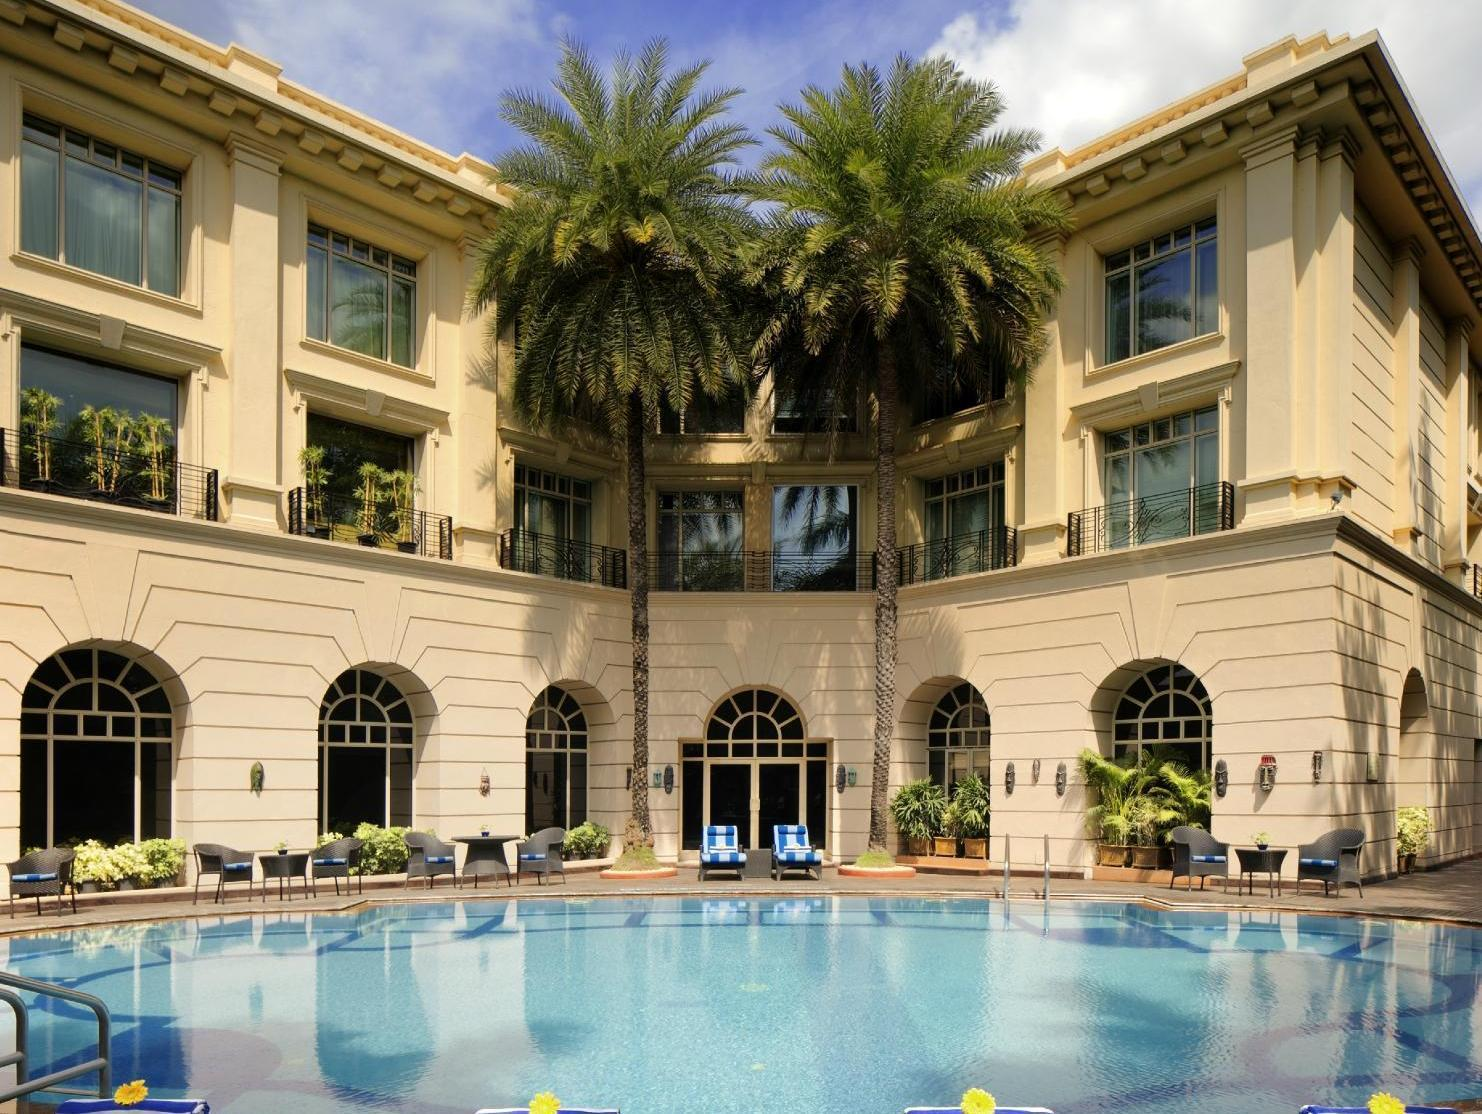 Radisson Blu Hotel GRT - Hotell och Boende i Indien i Chennai